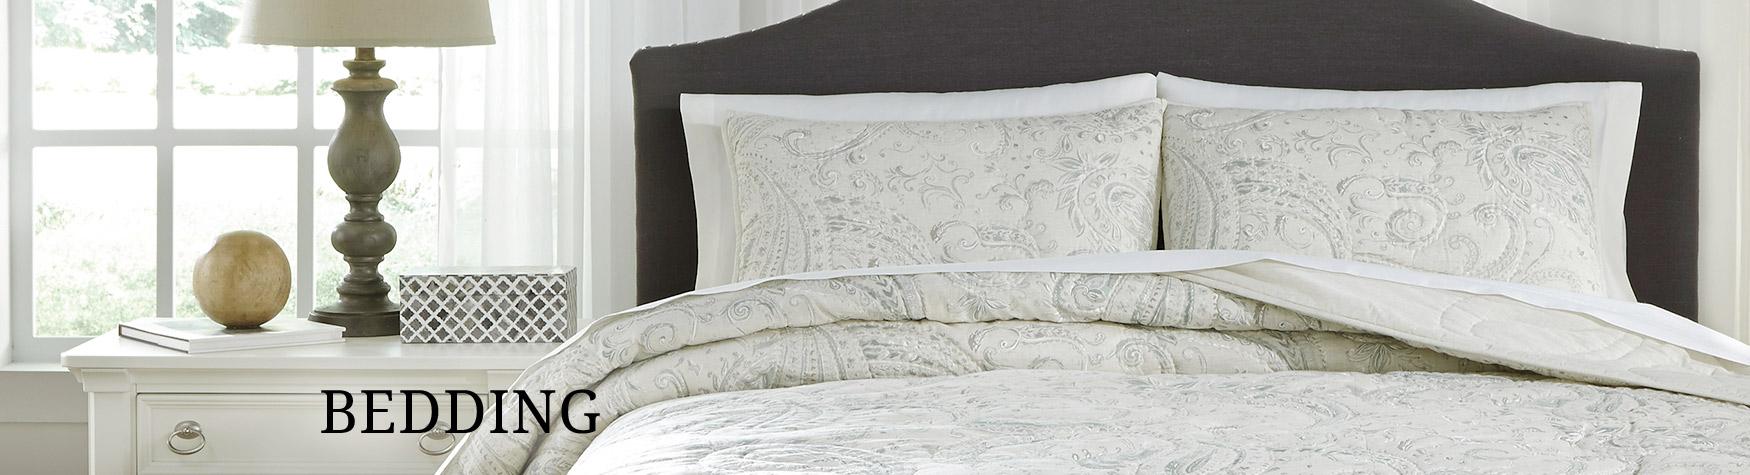 bedding-banner-1.jpg